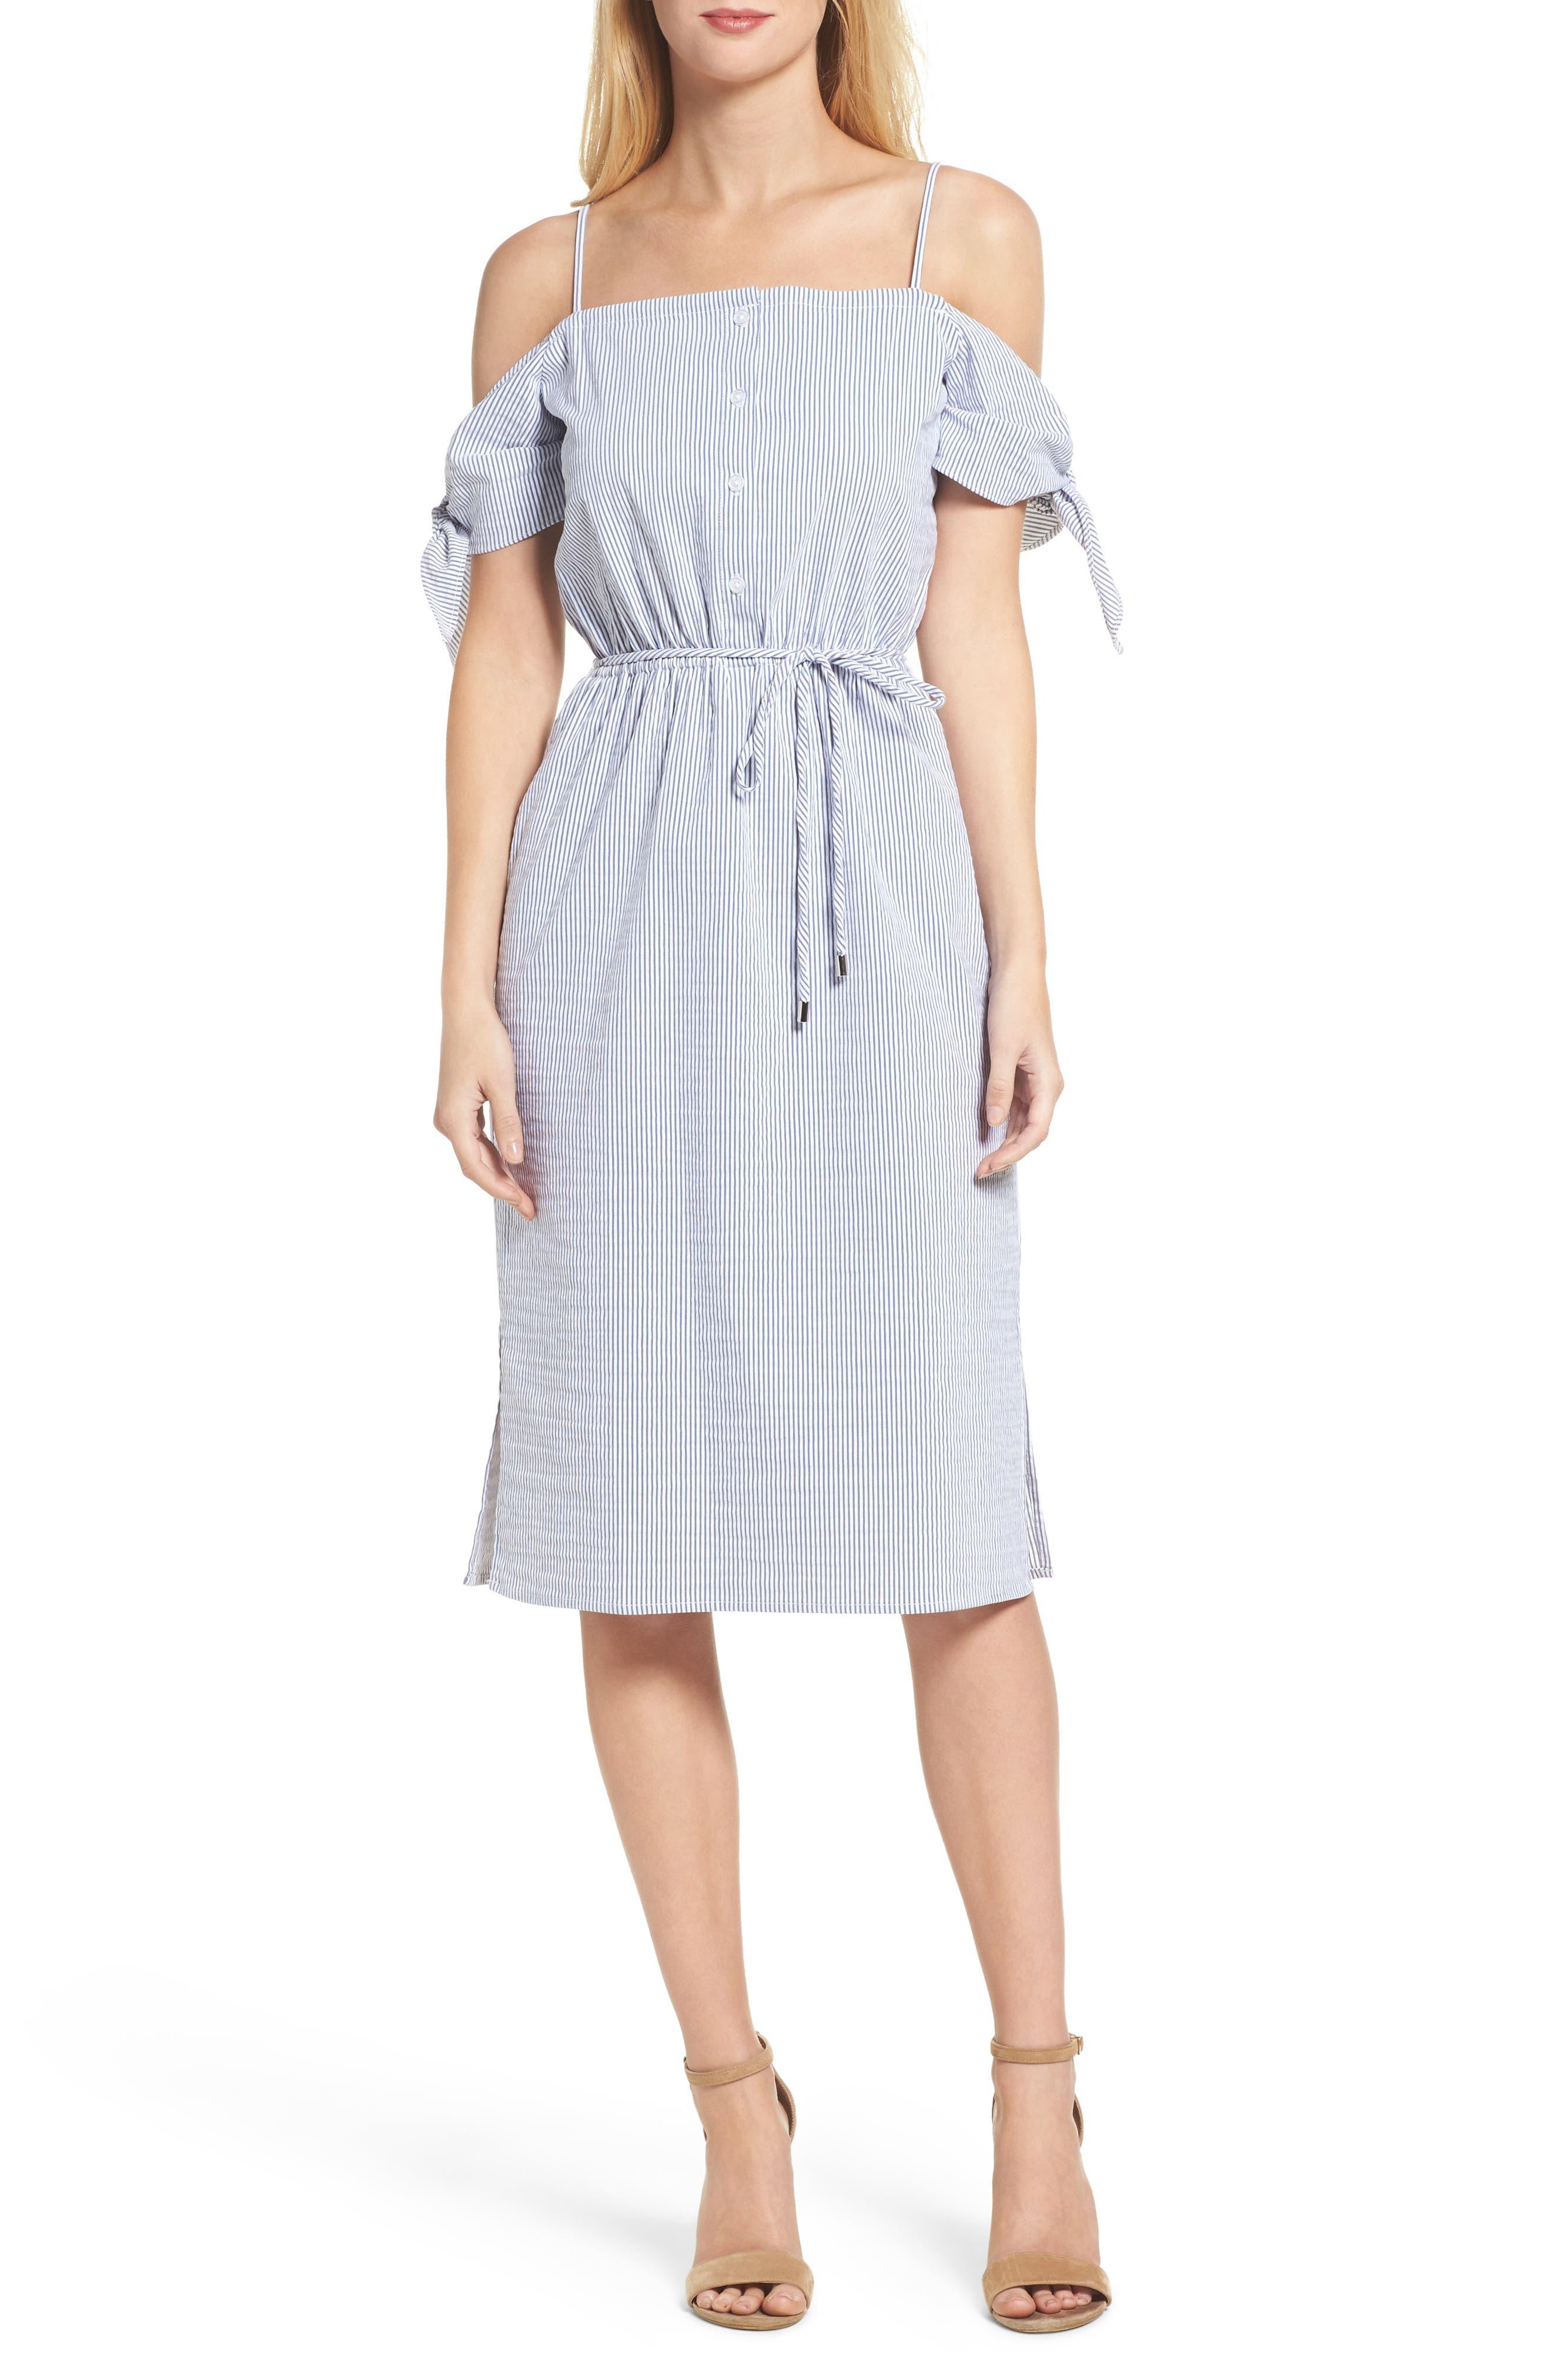 Off the Shoulder Dress,                         Main,                         color, Blue/ White